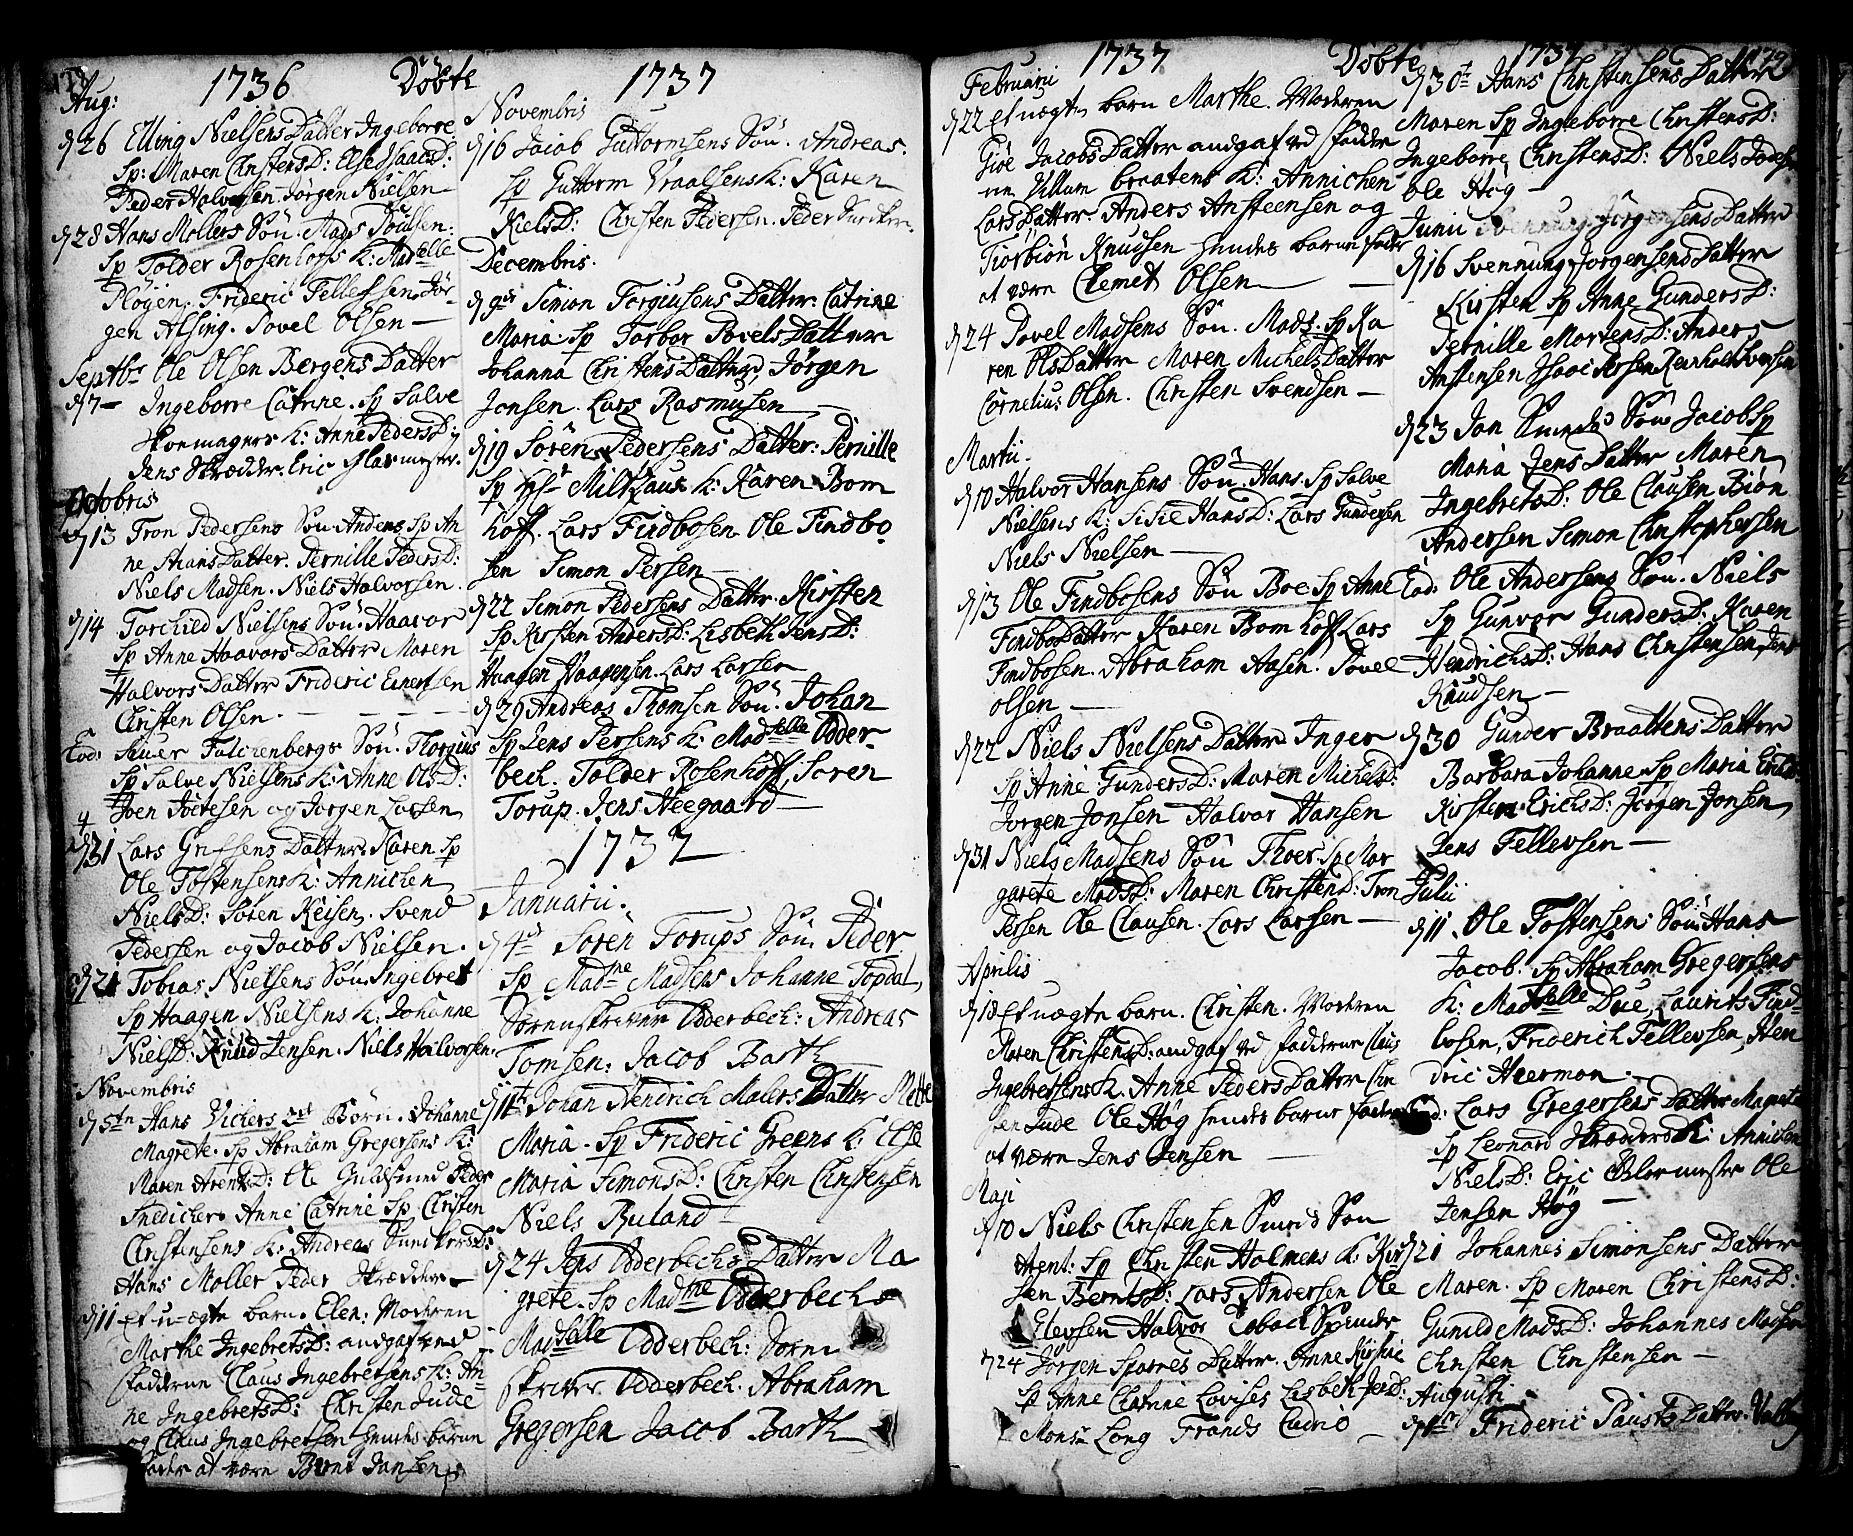 SAKO, Kragerø kirkebøker, F/Fa/L0001: Ministerialbok nr. 1, 1702-1766, s. 178-179